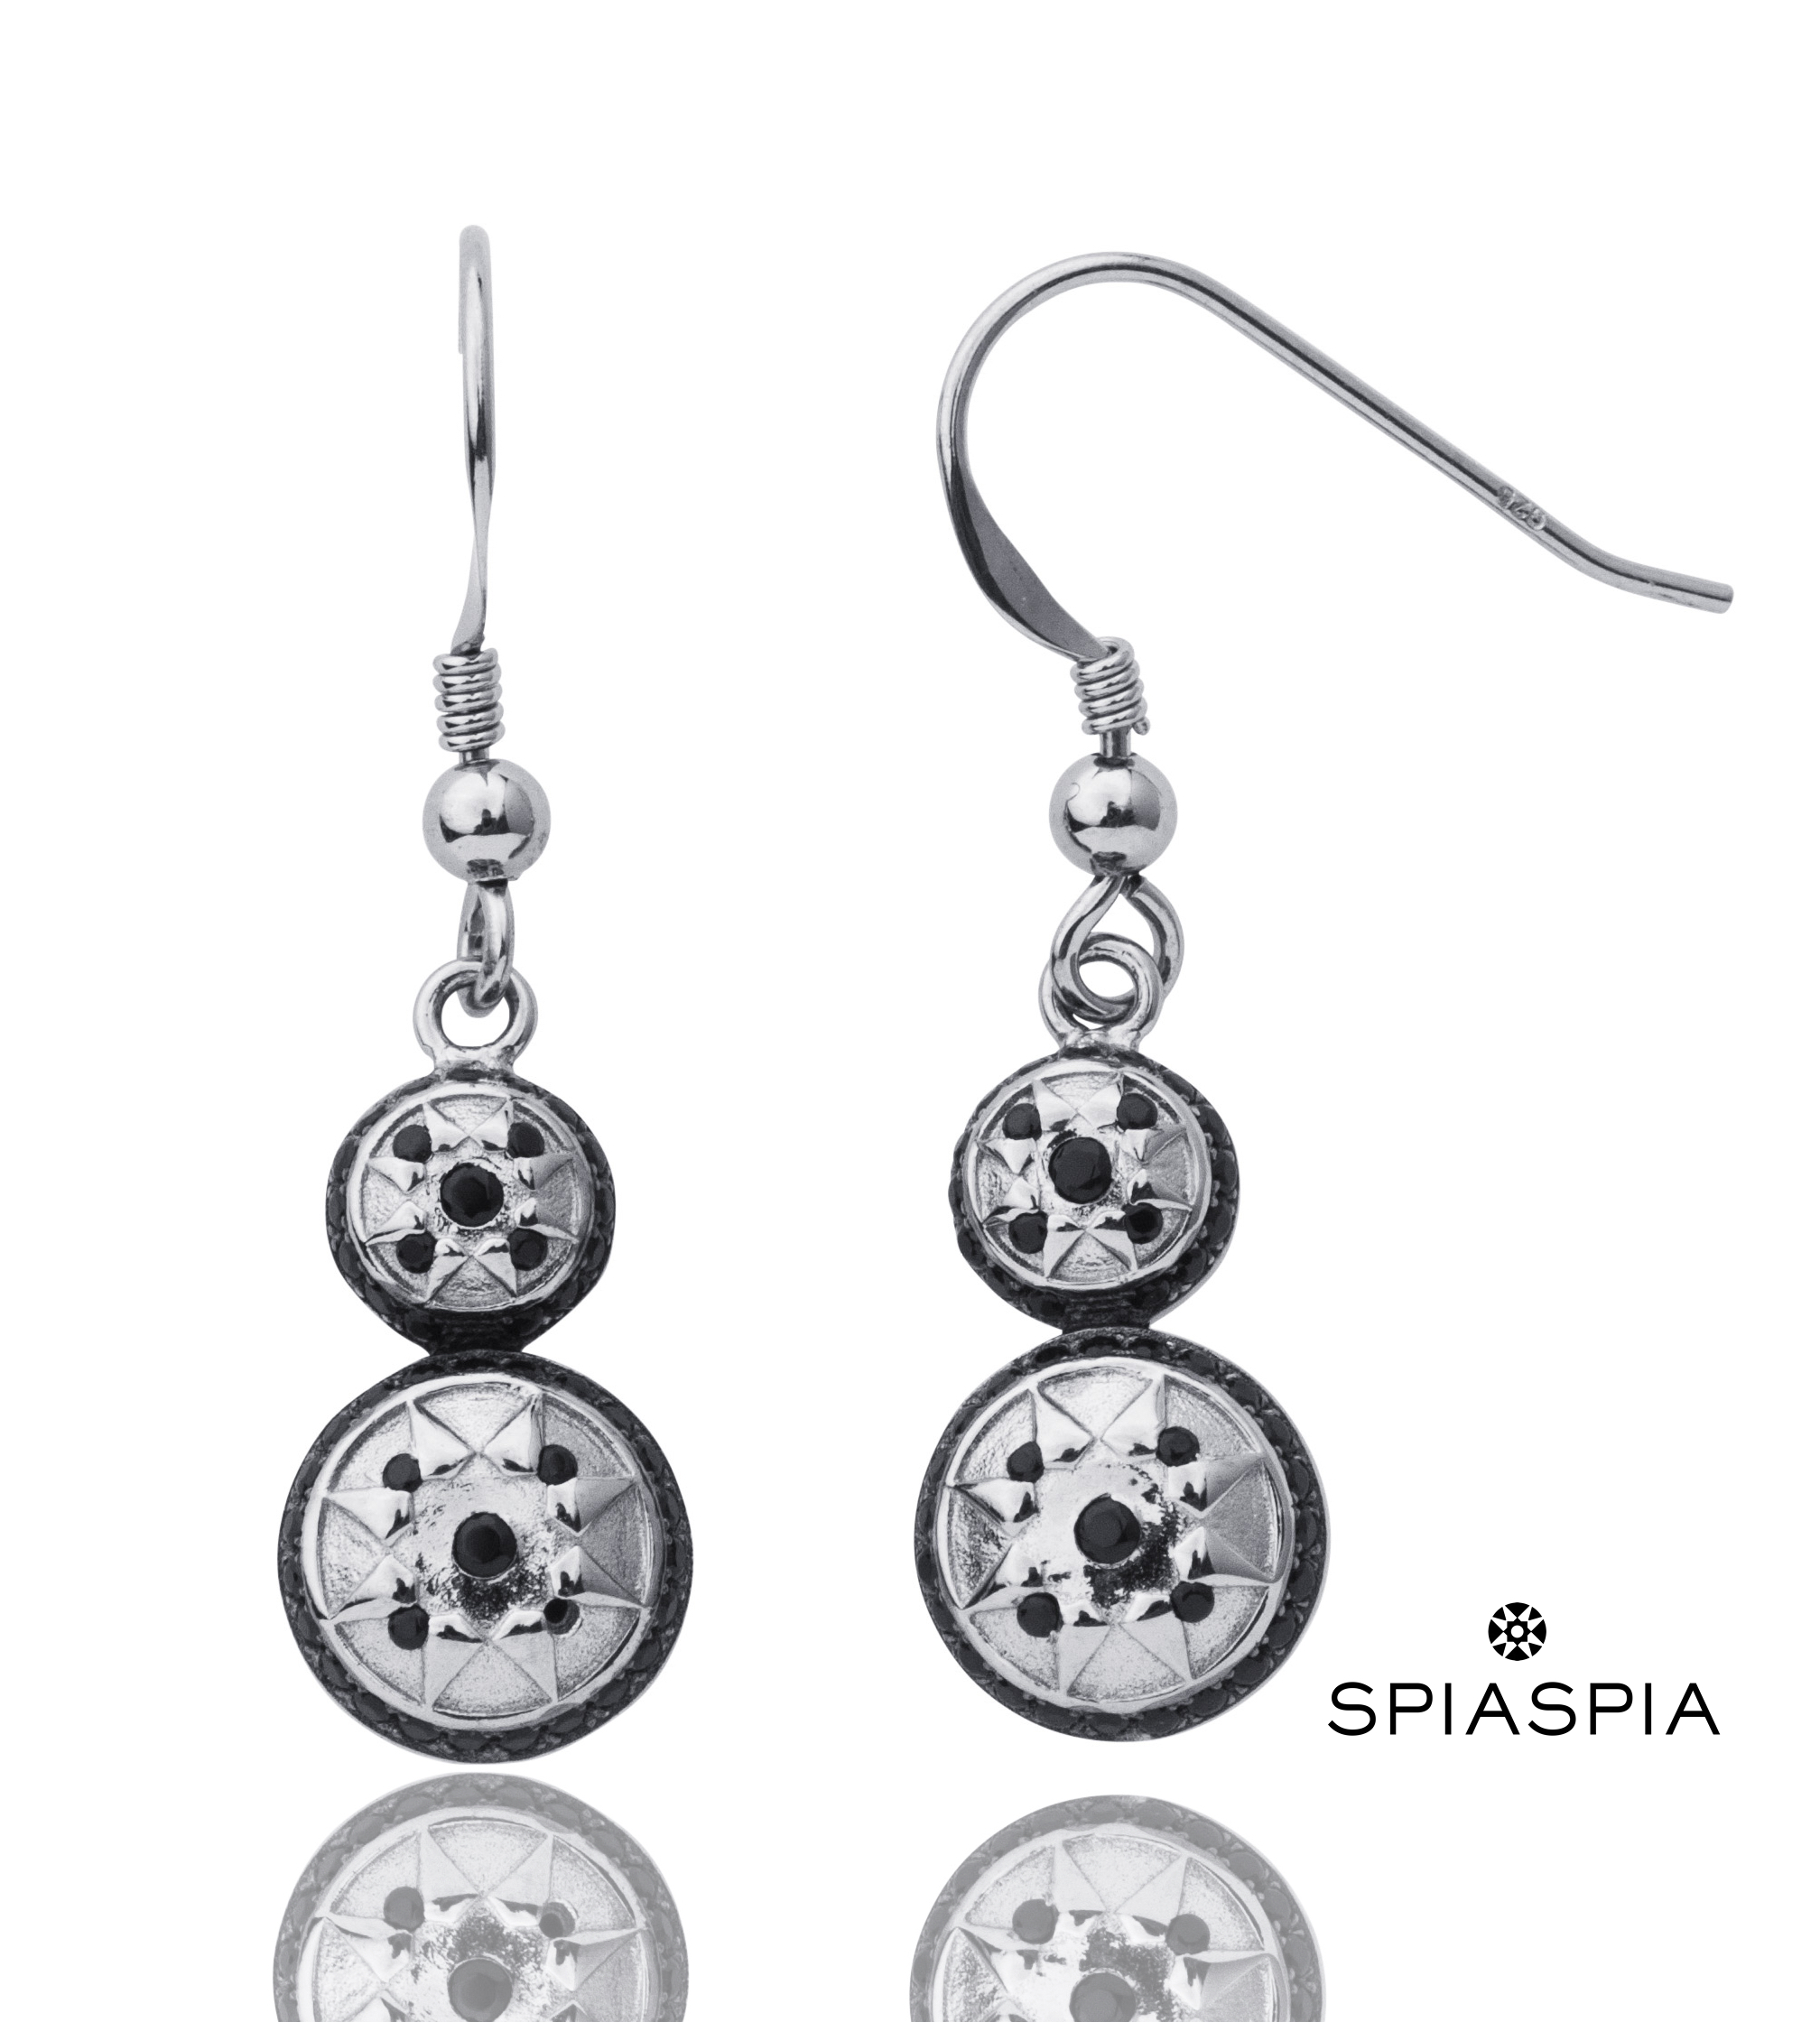 Spiaspia ROW øreringe - EAH-14020024-22